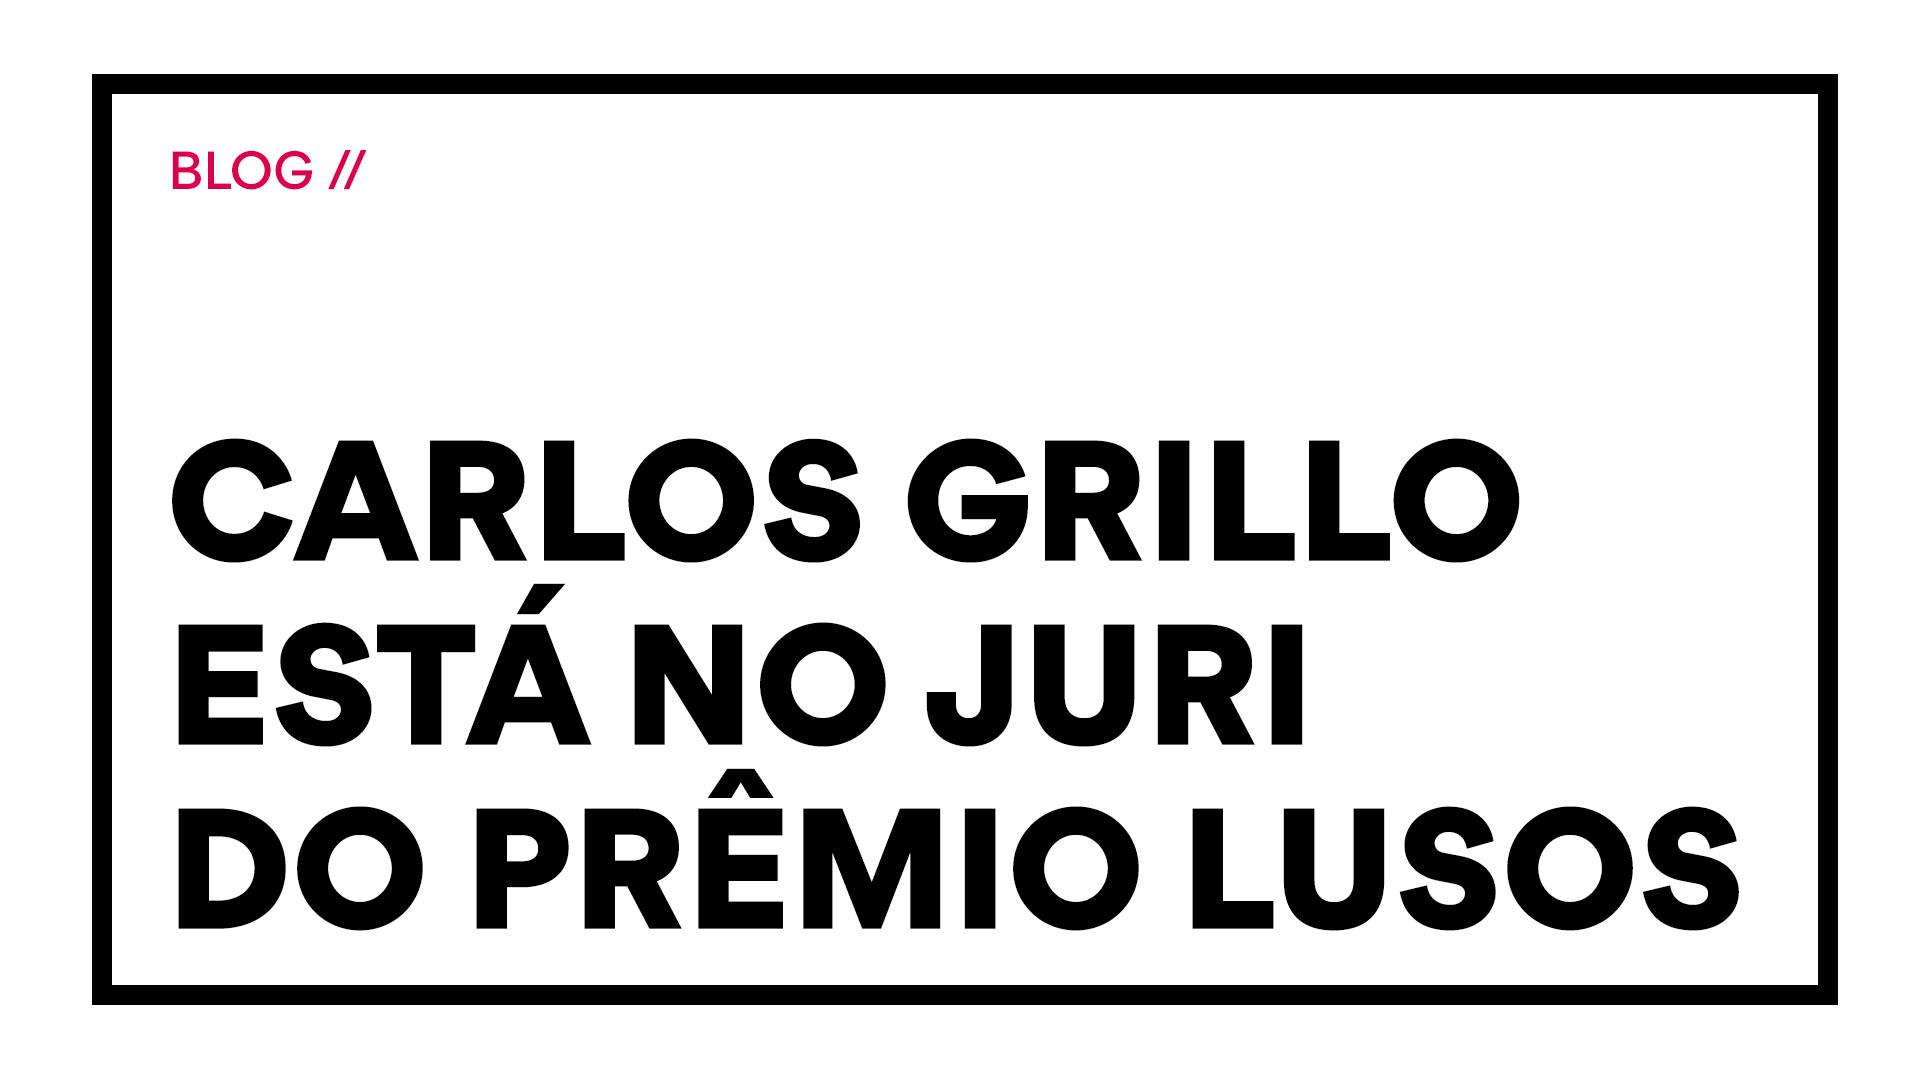 Prêmio Lusos – Carlos Grillo está entre os jurados